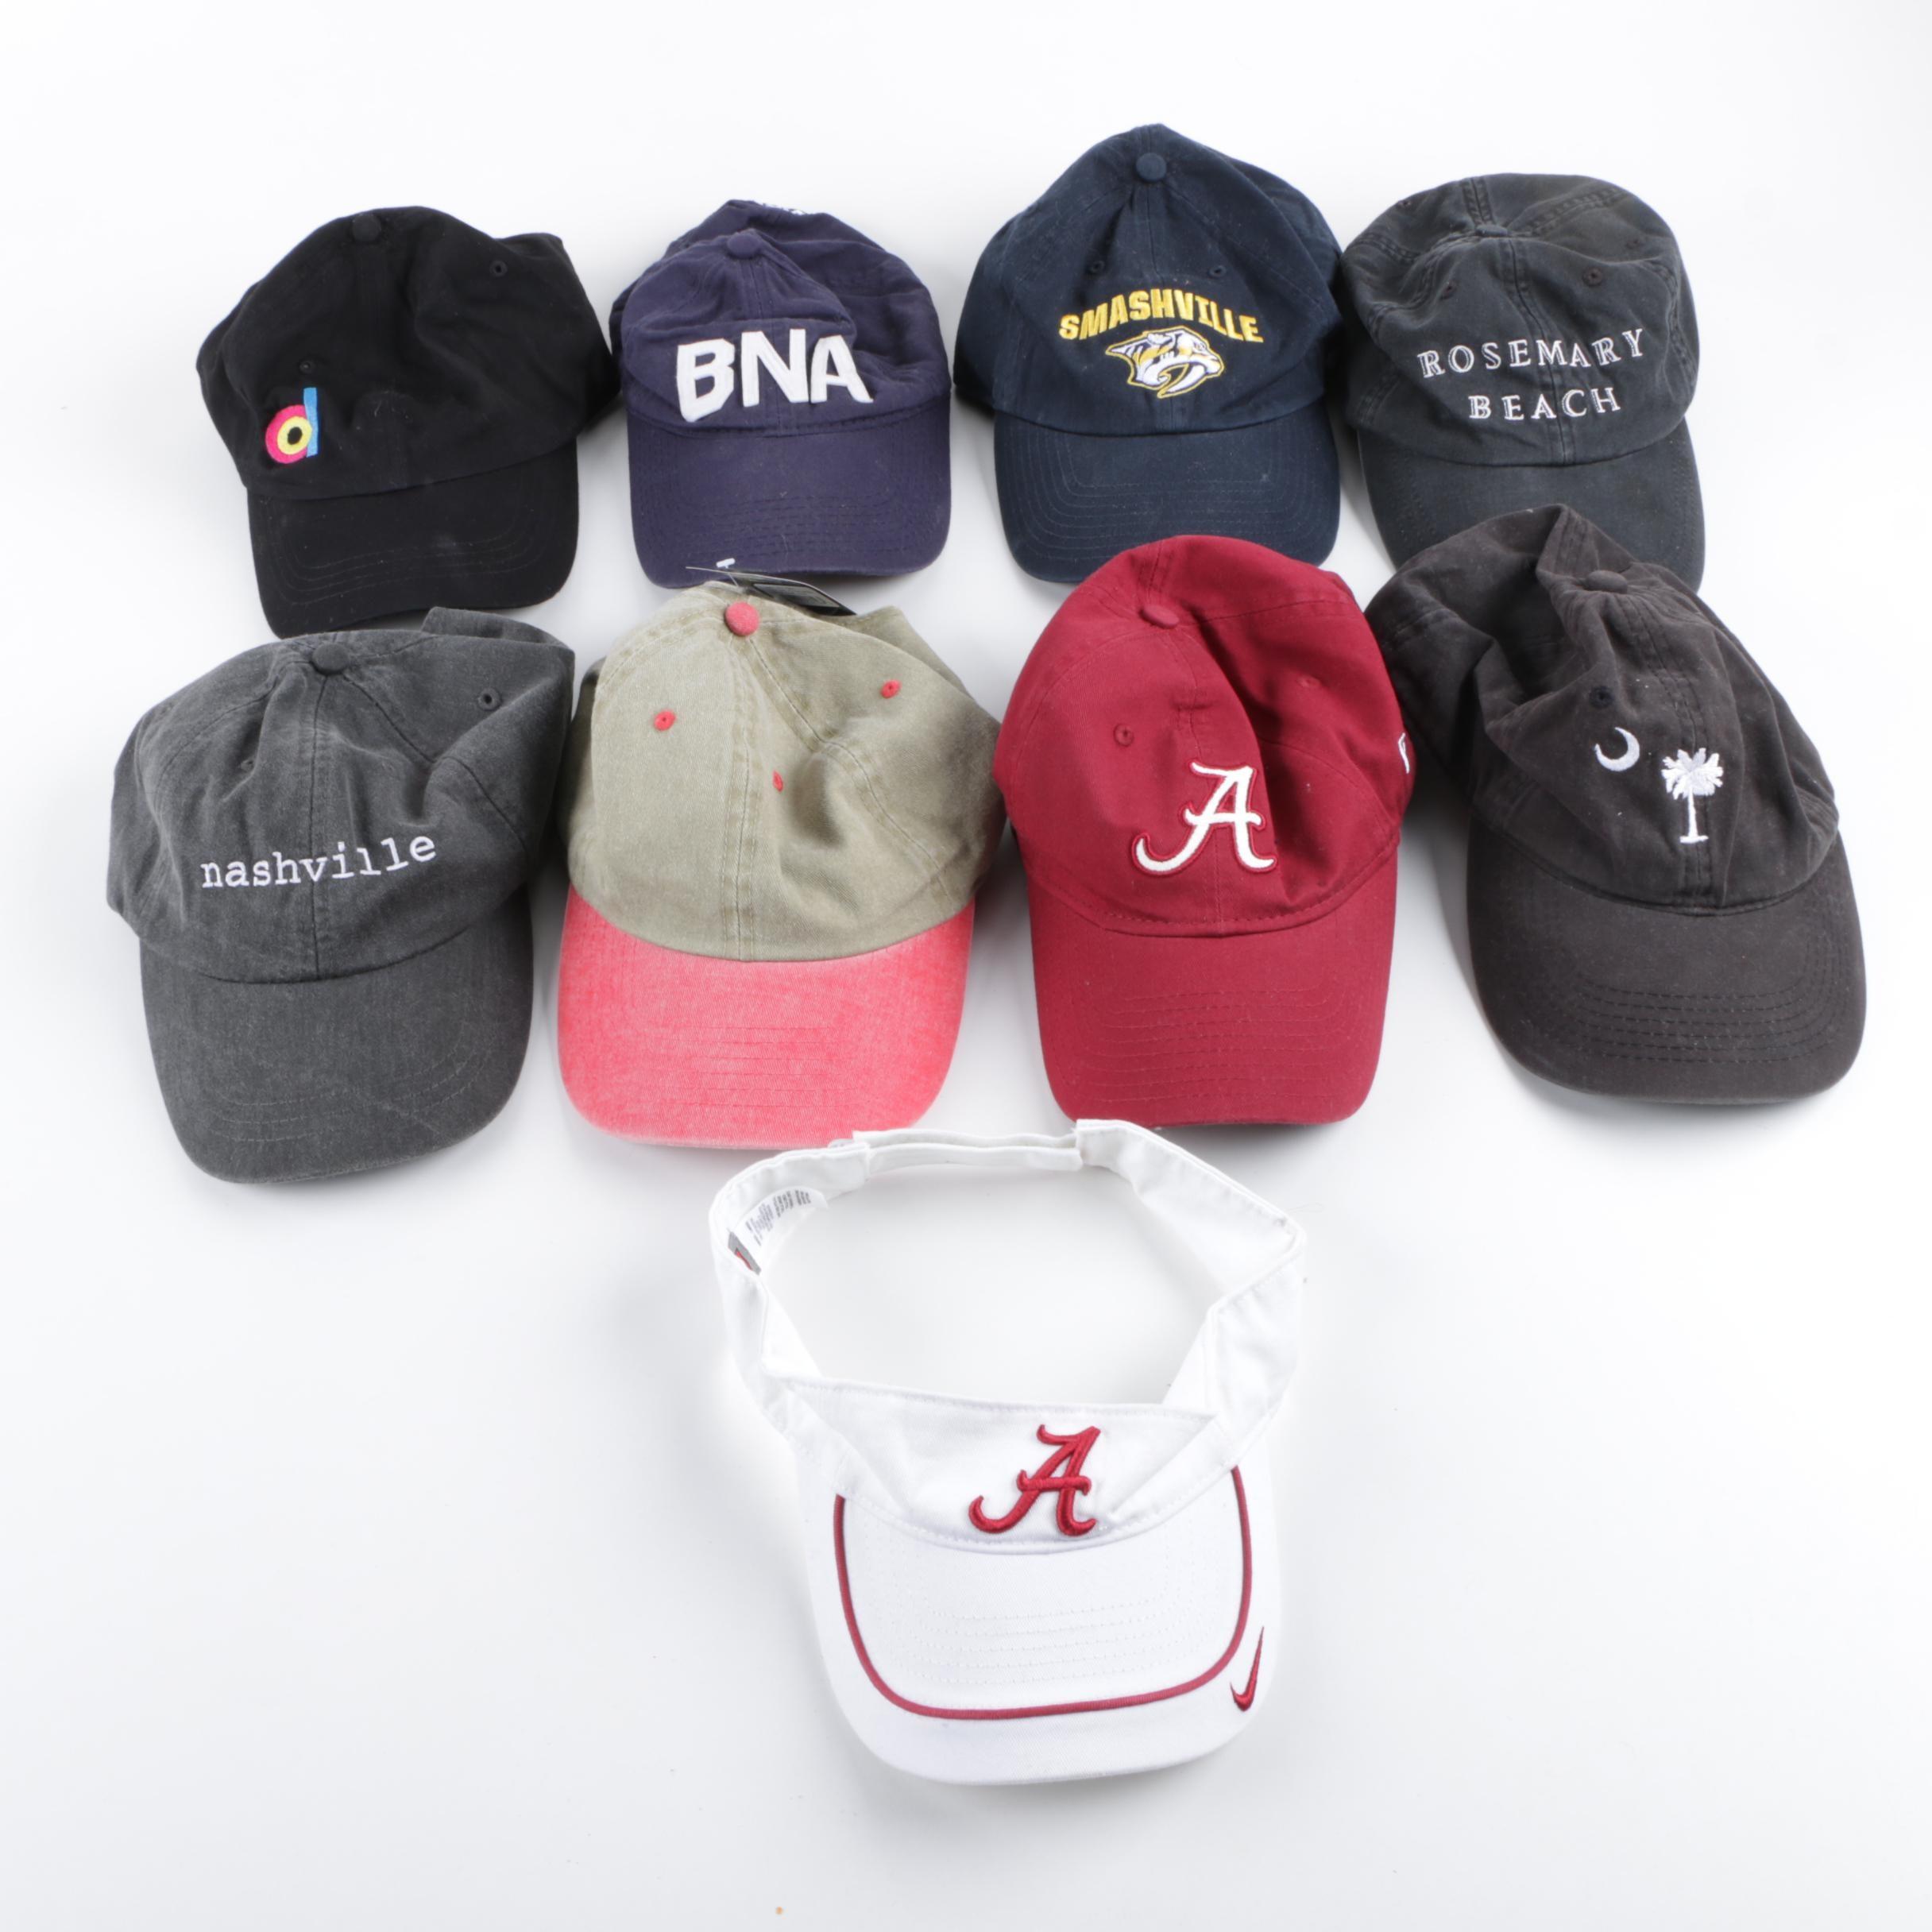 Unisex Baseball Style Caps and Visor